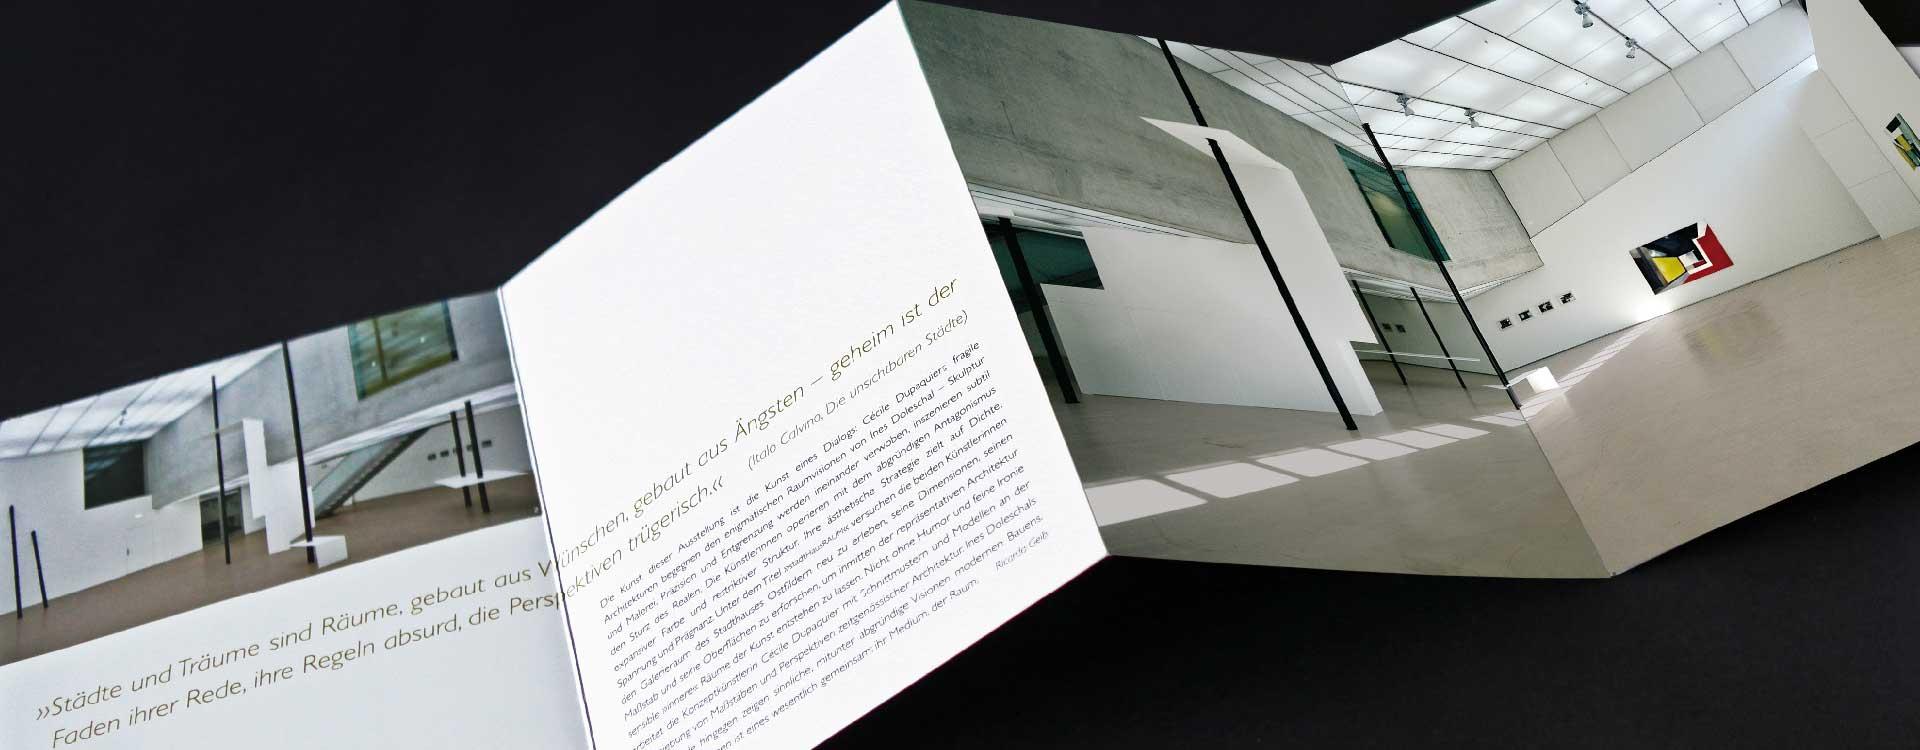 Leaflet for the exhibition StadtHausRaum with Ines Doleschal and Cécile Dupaquier in the Ostfildern Town Gallery; Design: Kattrin Richter | Graphic Design Studio